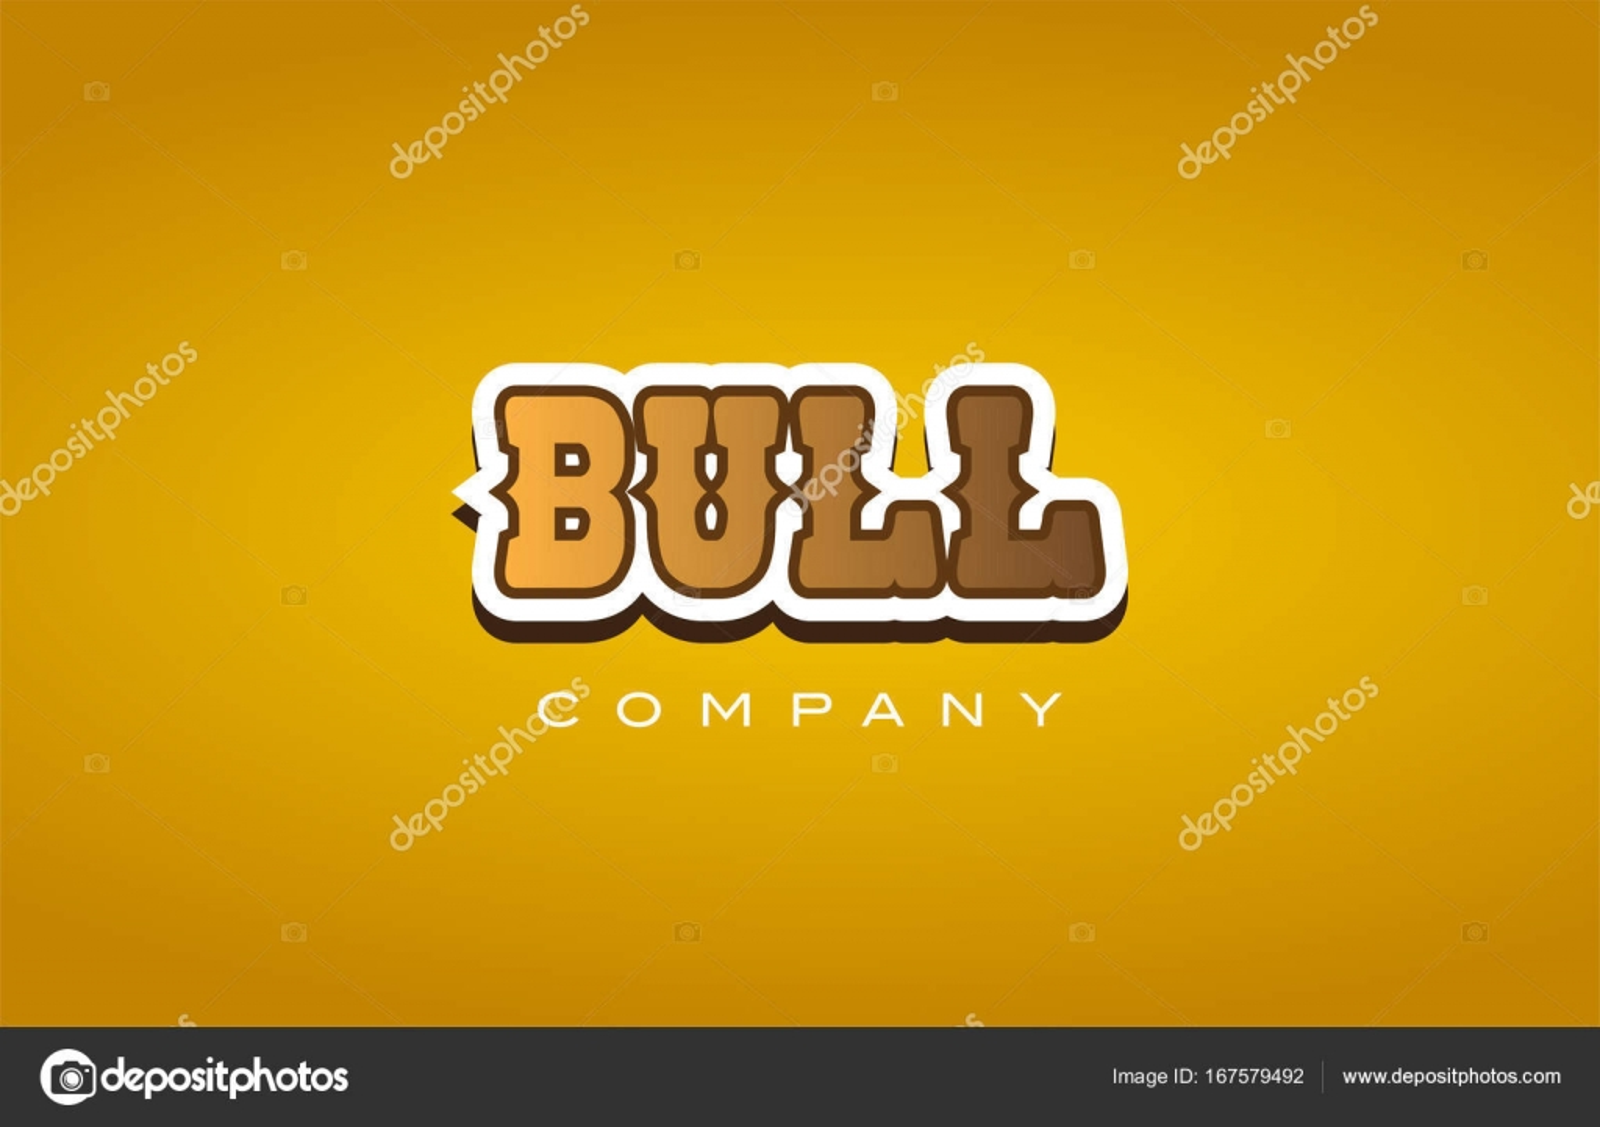 bull western style word text logo design icon company \u2014 Stock Vector